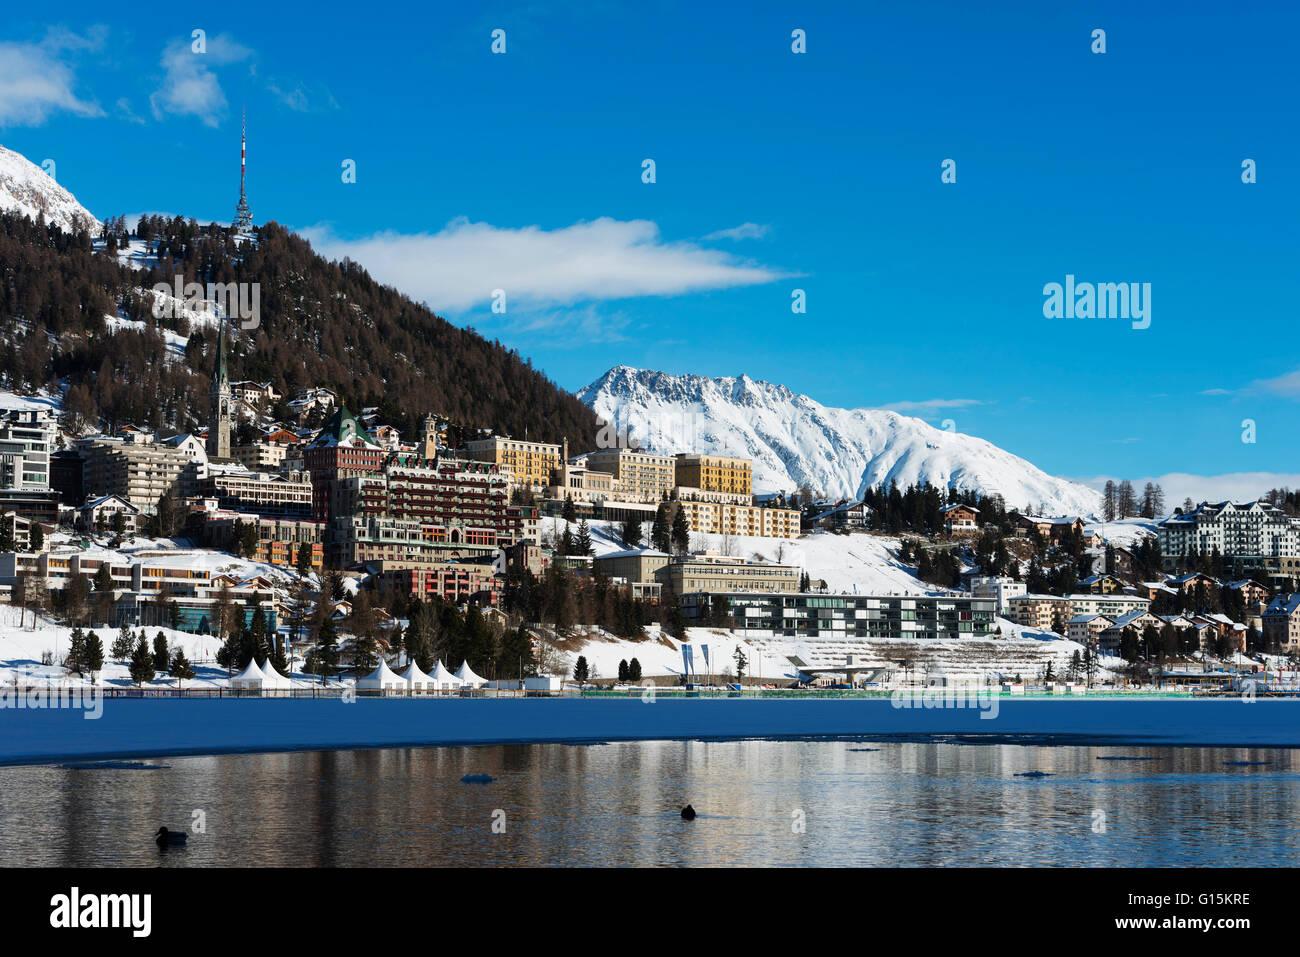 Am See, St. Moritz im Winter, Engadin, Graubünden, Schweiz, Europa Stockbild